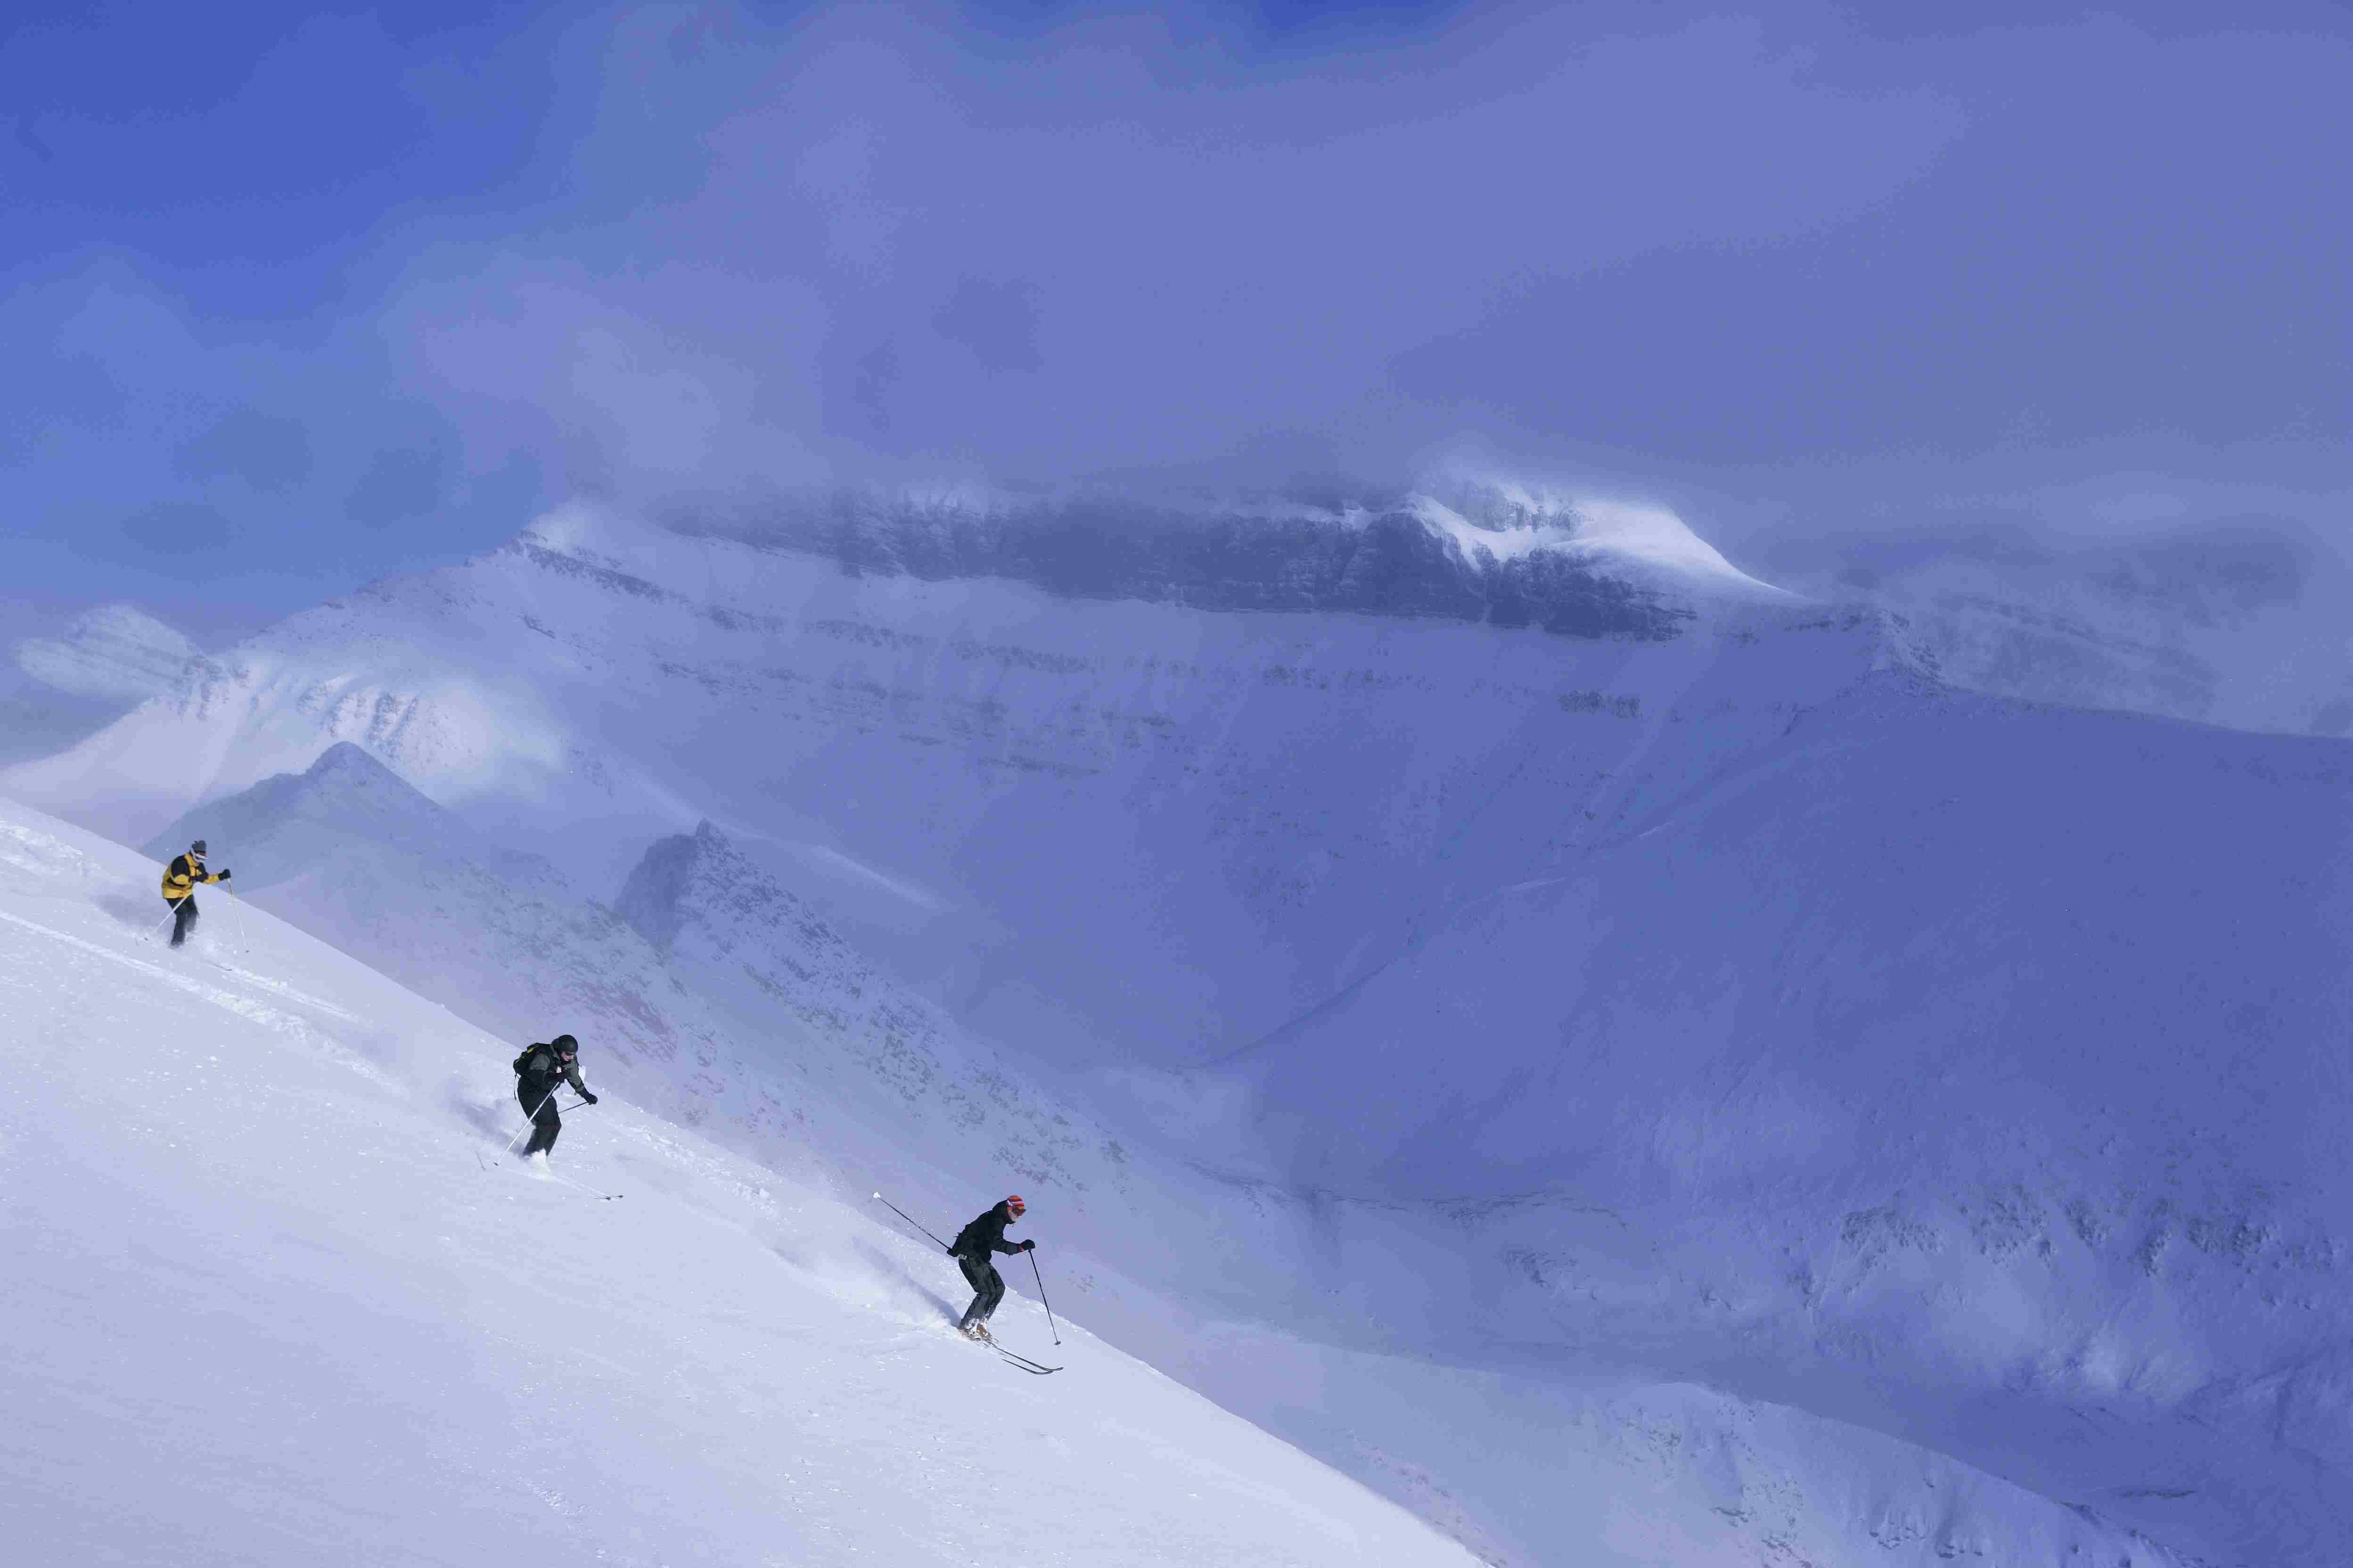 Three skiers in deep snow, Lake Louise, Alberta, Canada